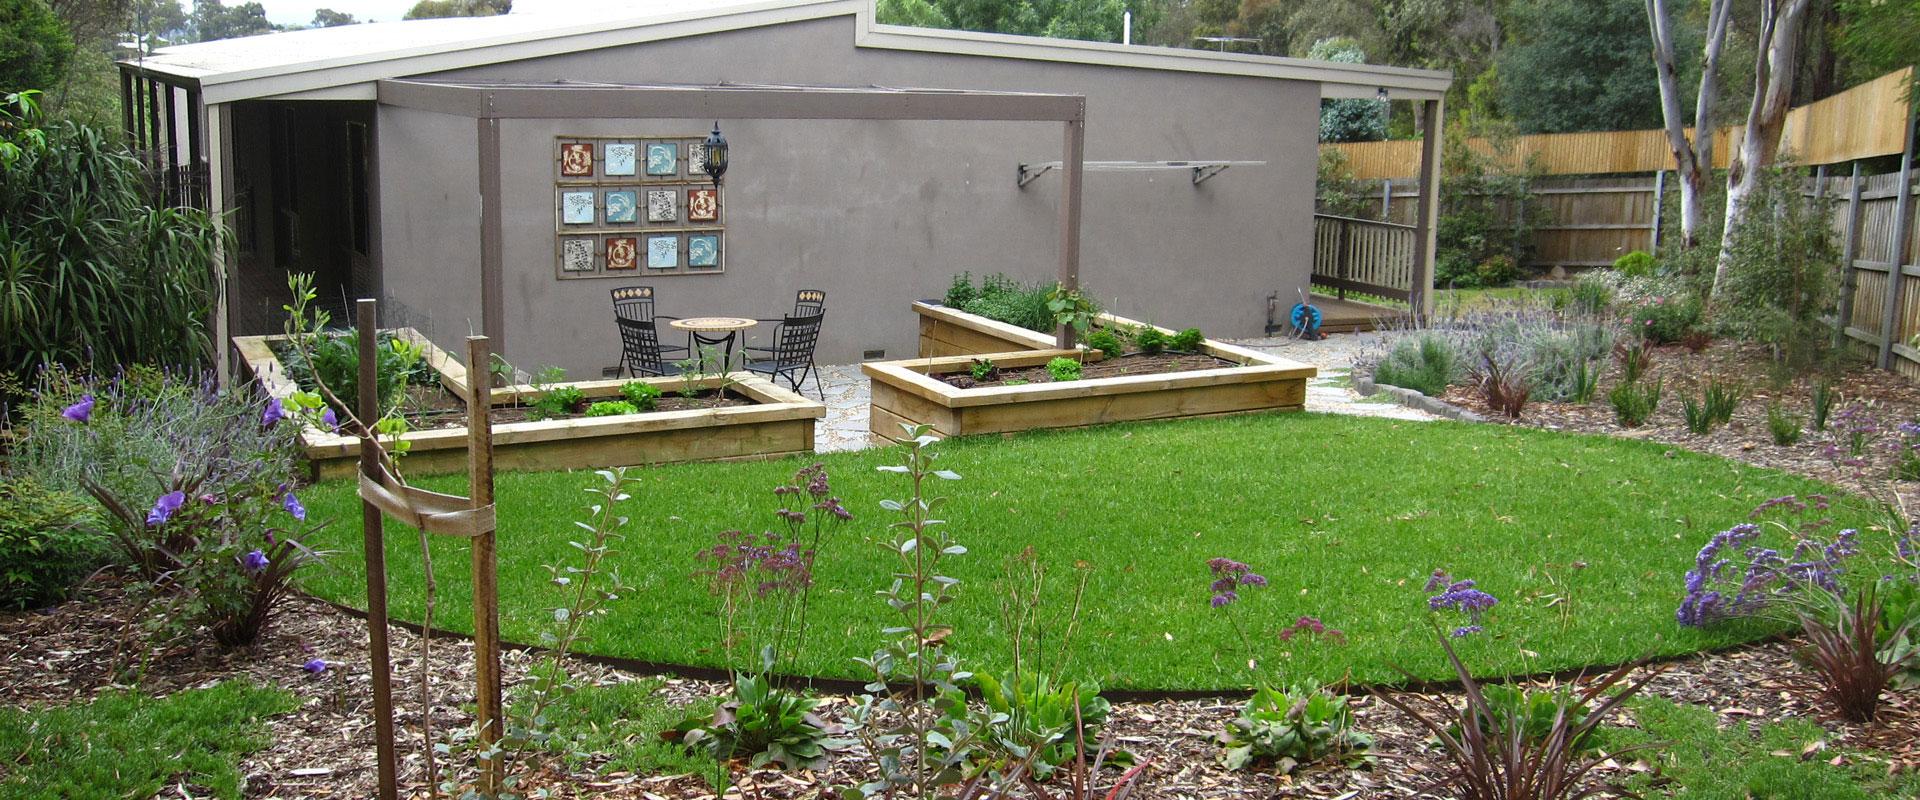 Why get a Garden Design? - Arcadia Sustainable Design on Arcadia Backyard Designs id=17673